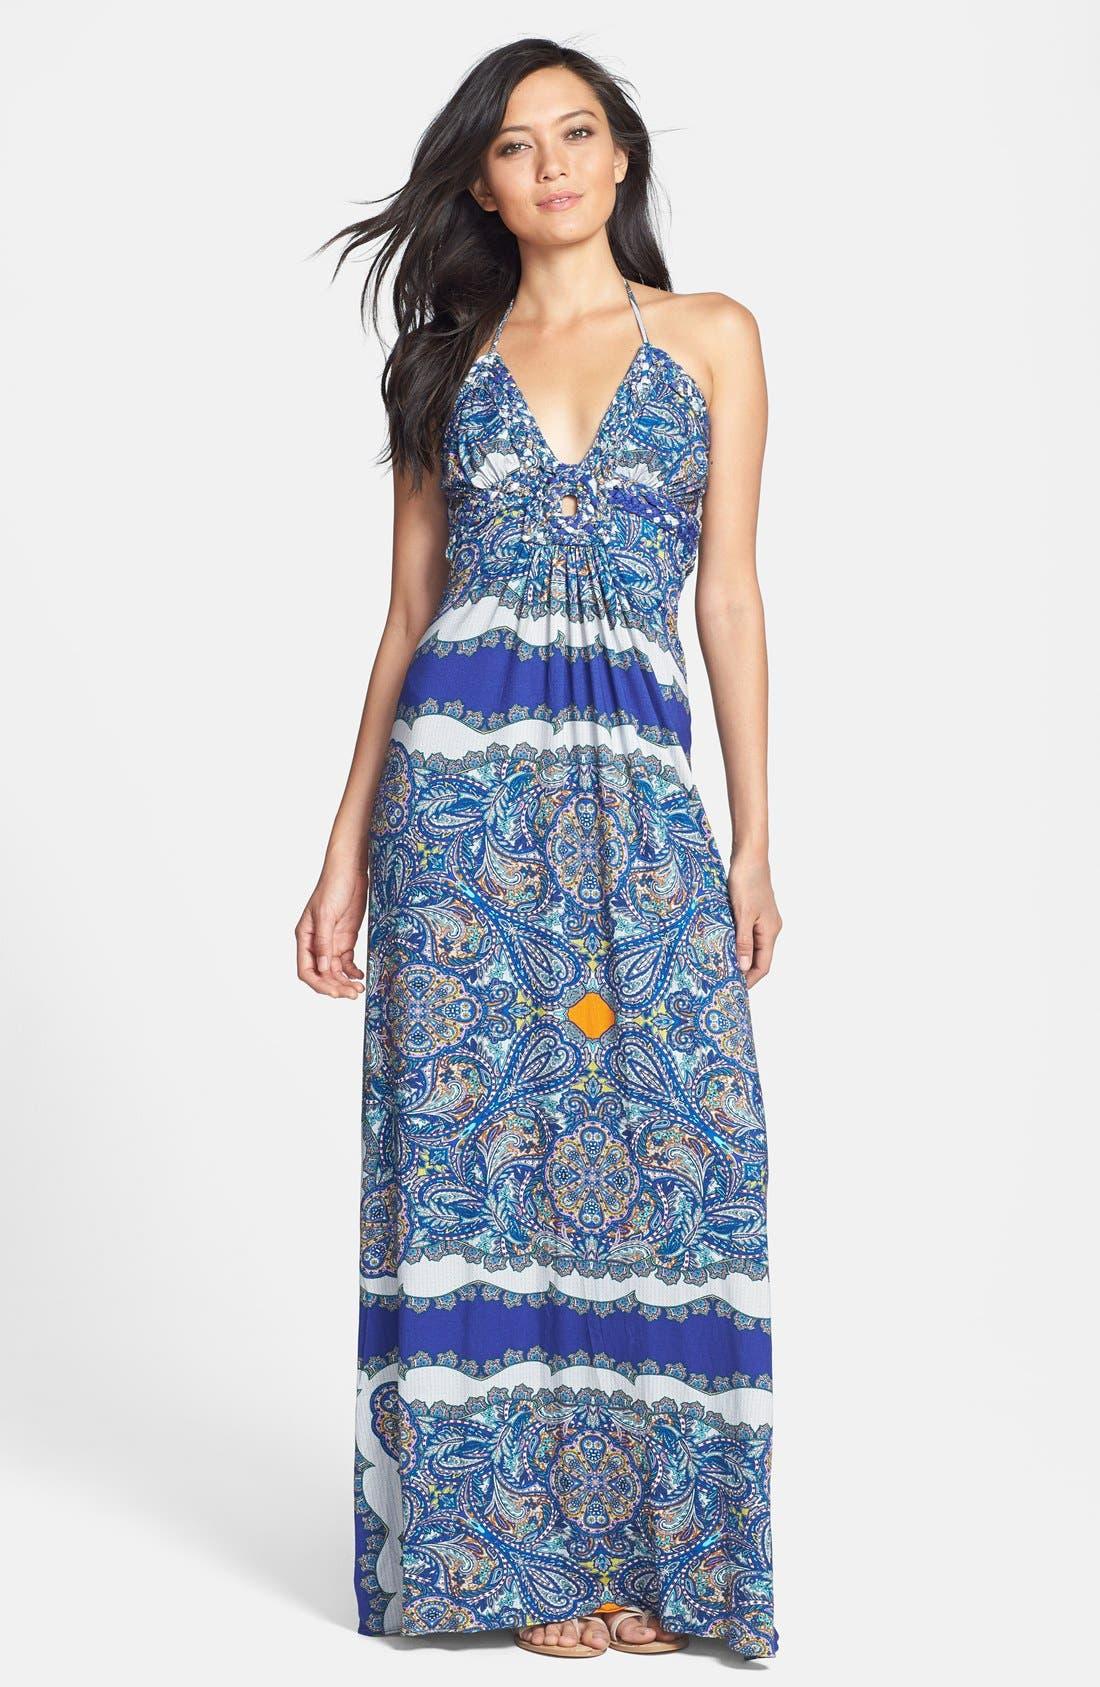 Main Image - Sky 'Samuelaa' Print Halter Maxi Dress